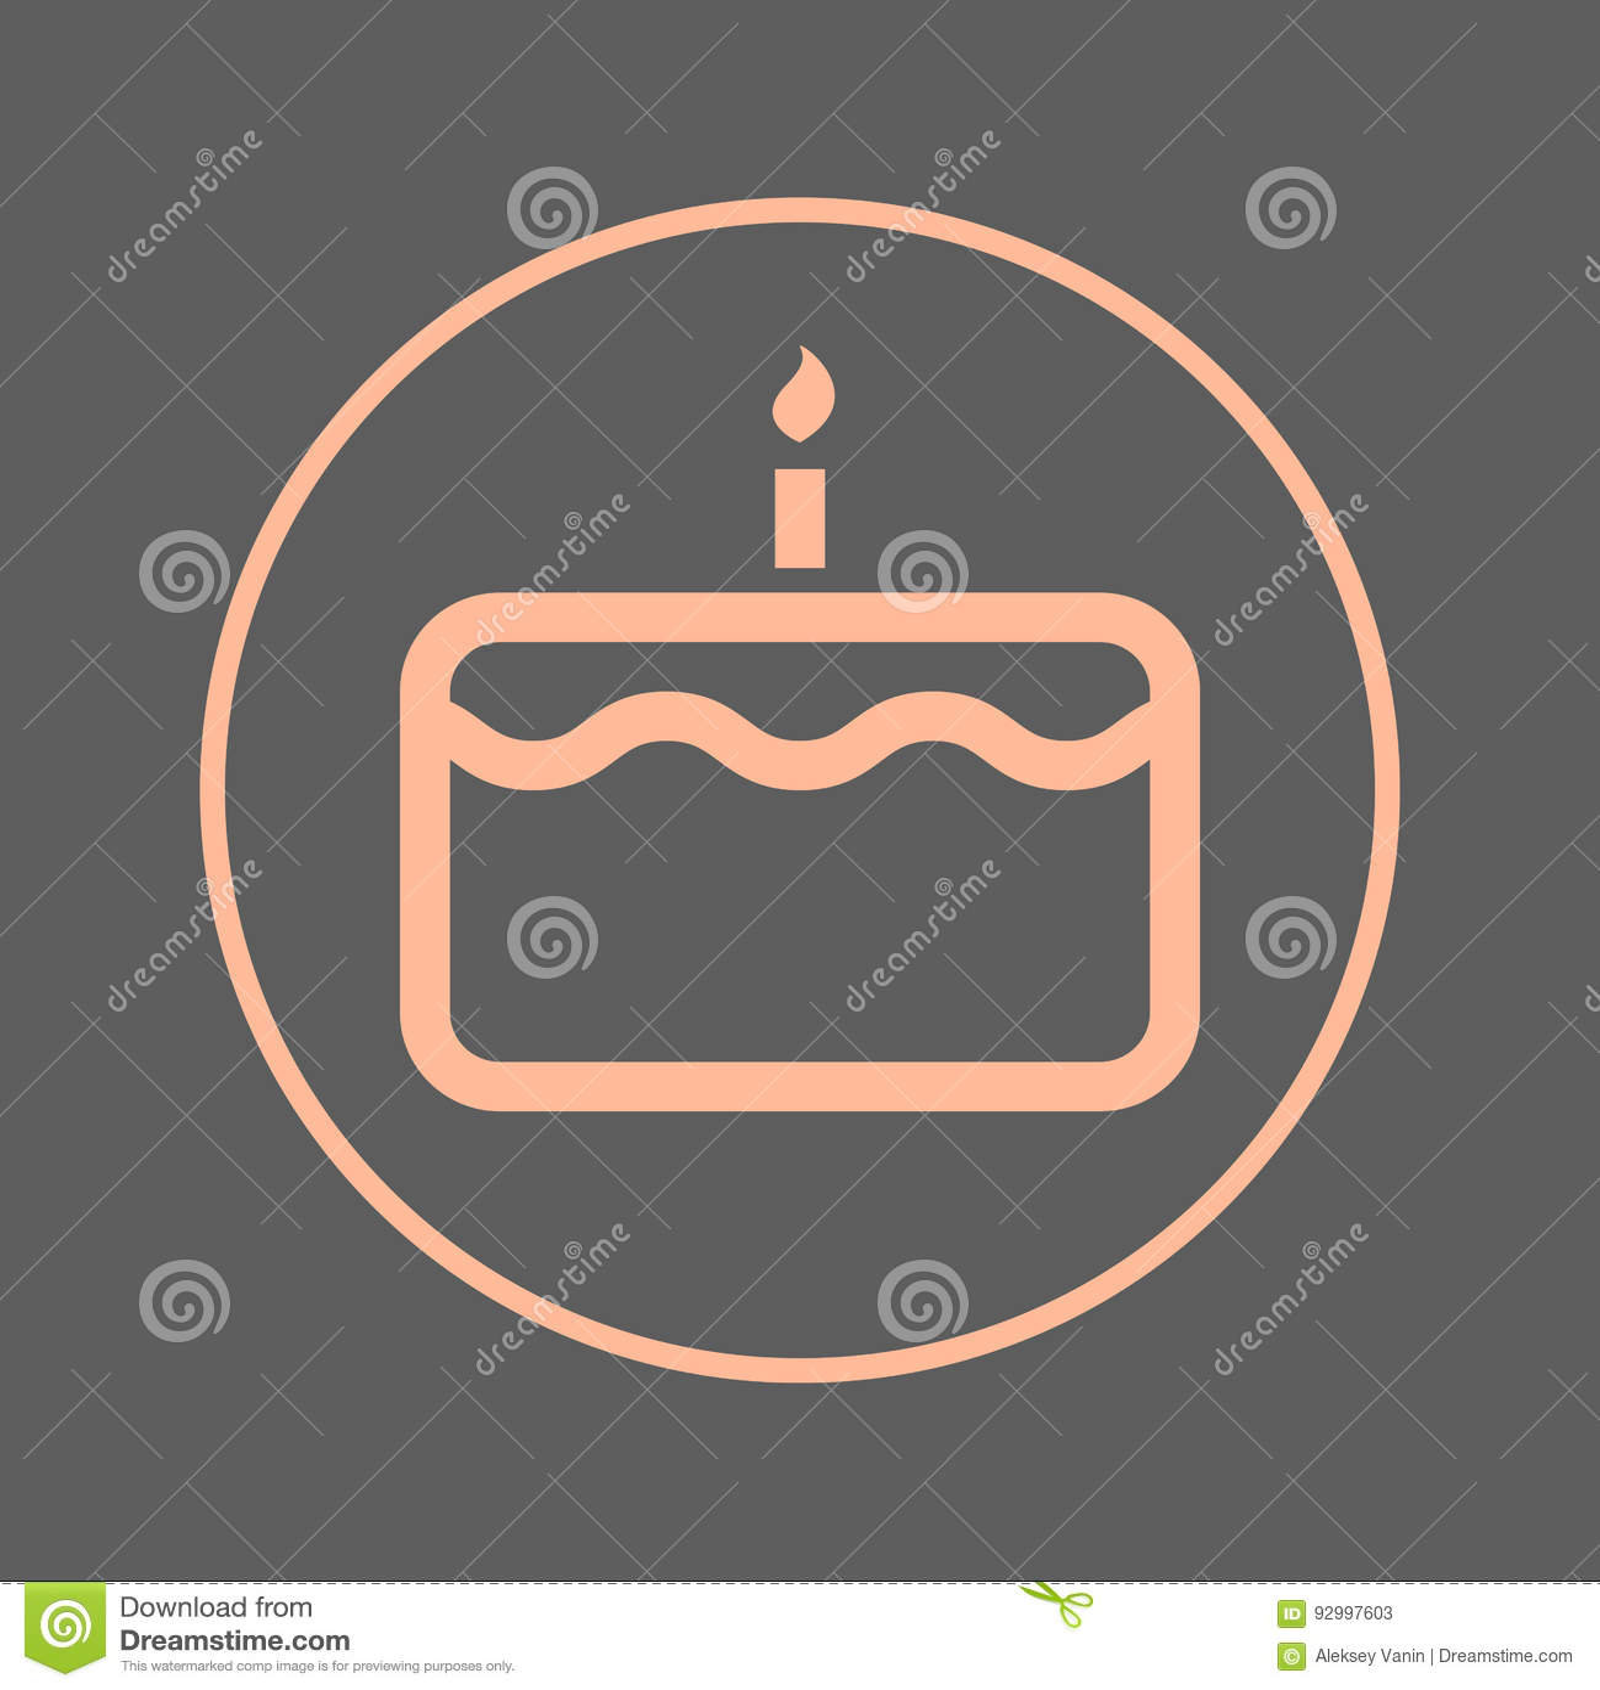 Birthday cake with candle circular line icon round colorful sign birthday cake with candle circular line icon round colorful sign flat style vector symbol biocorpaavc